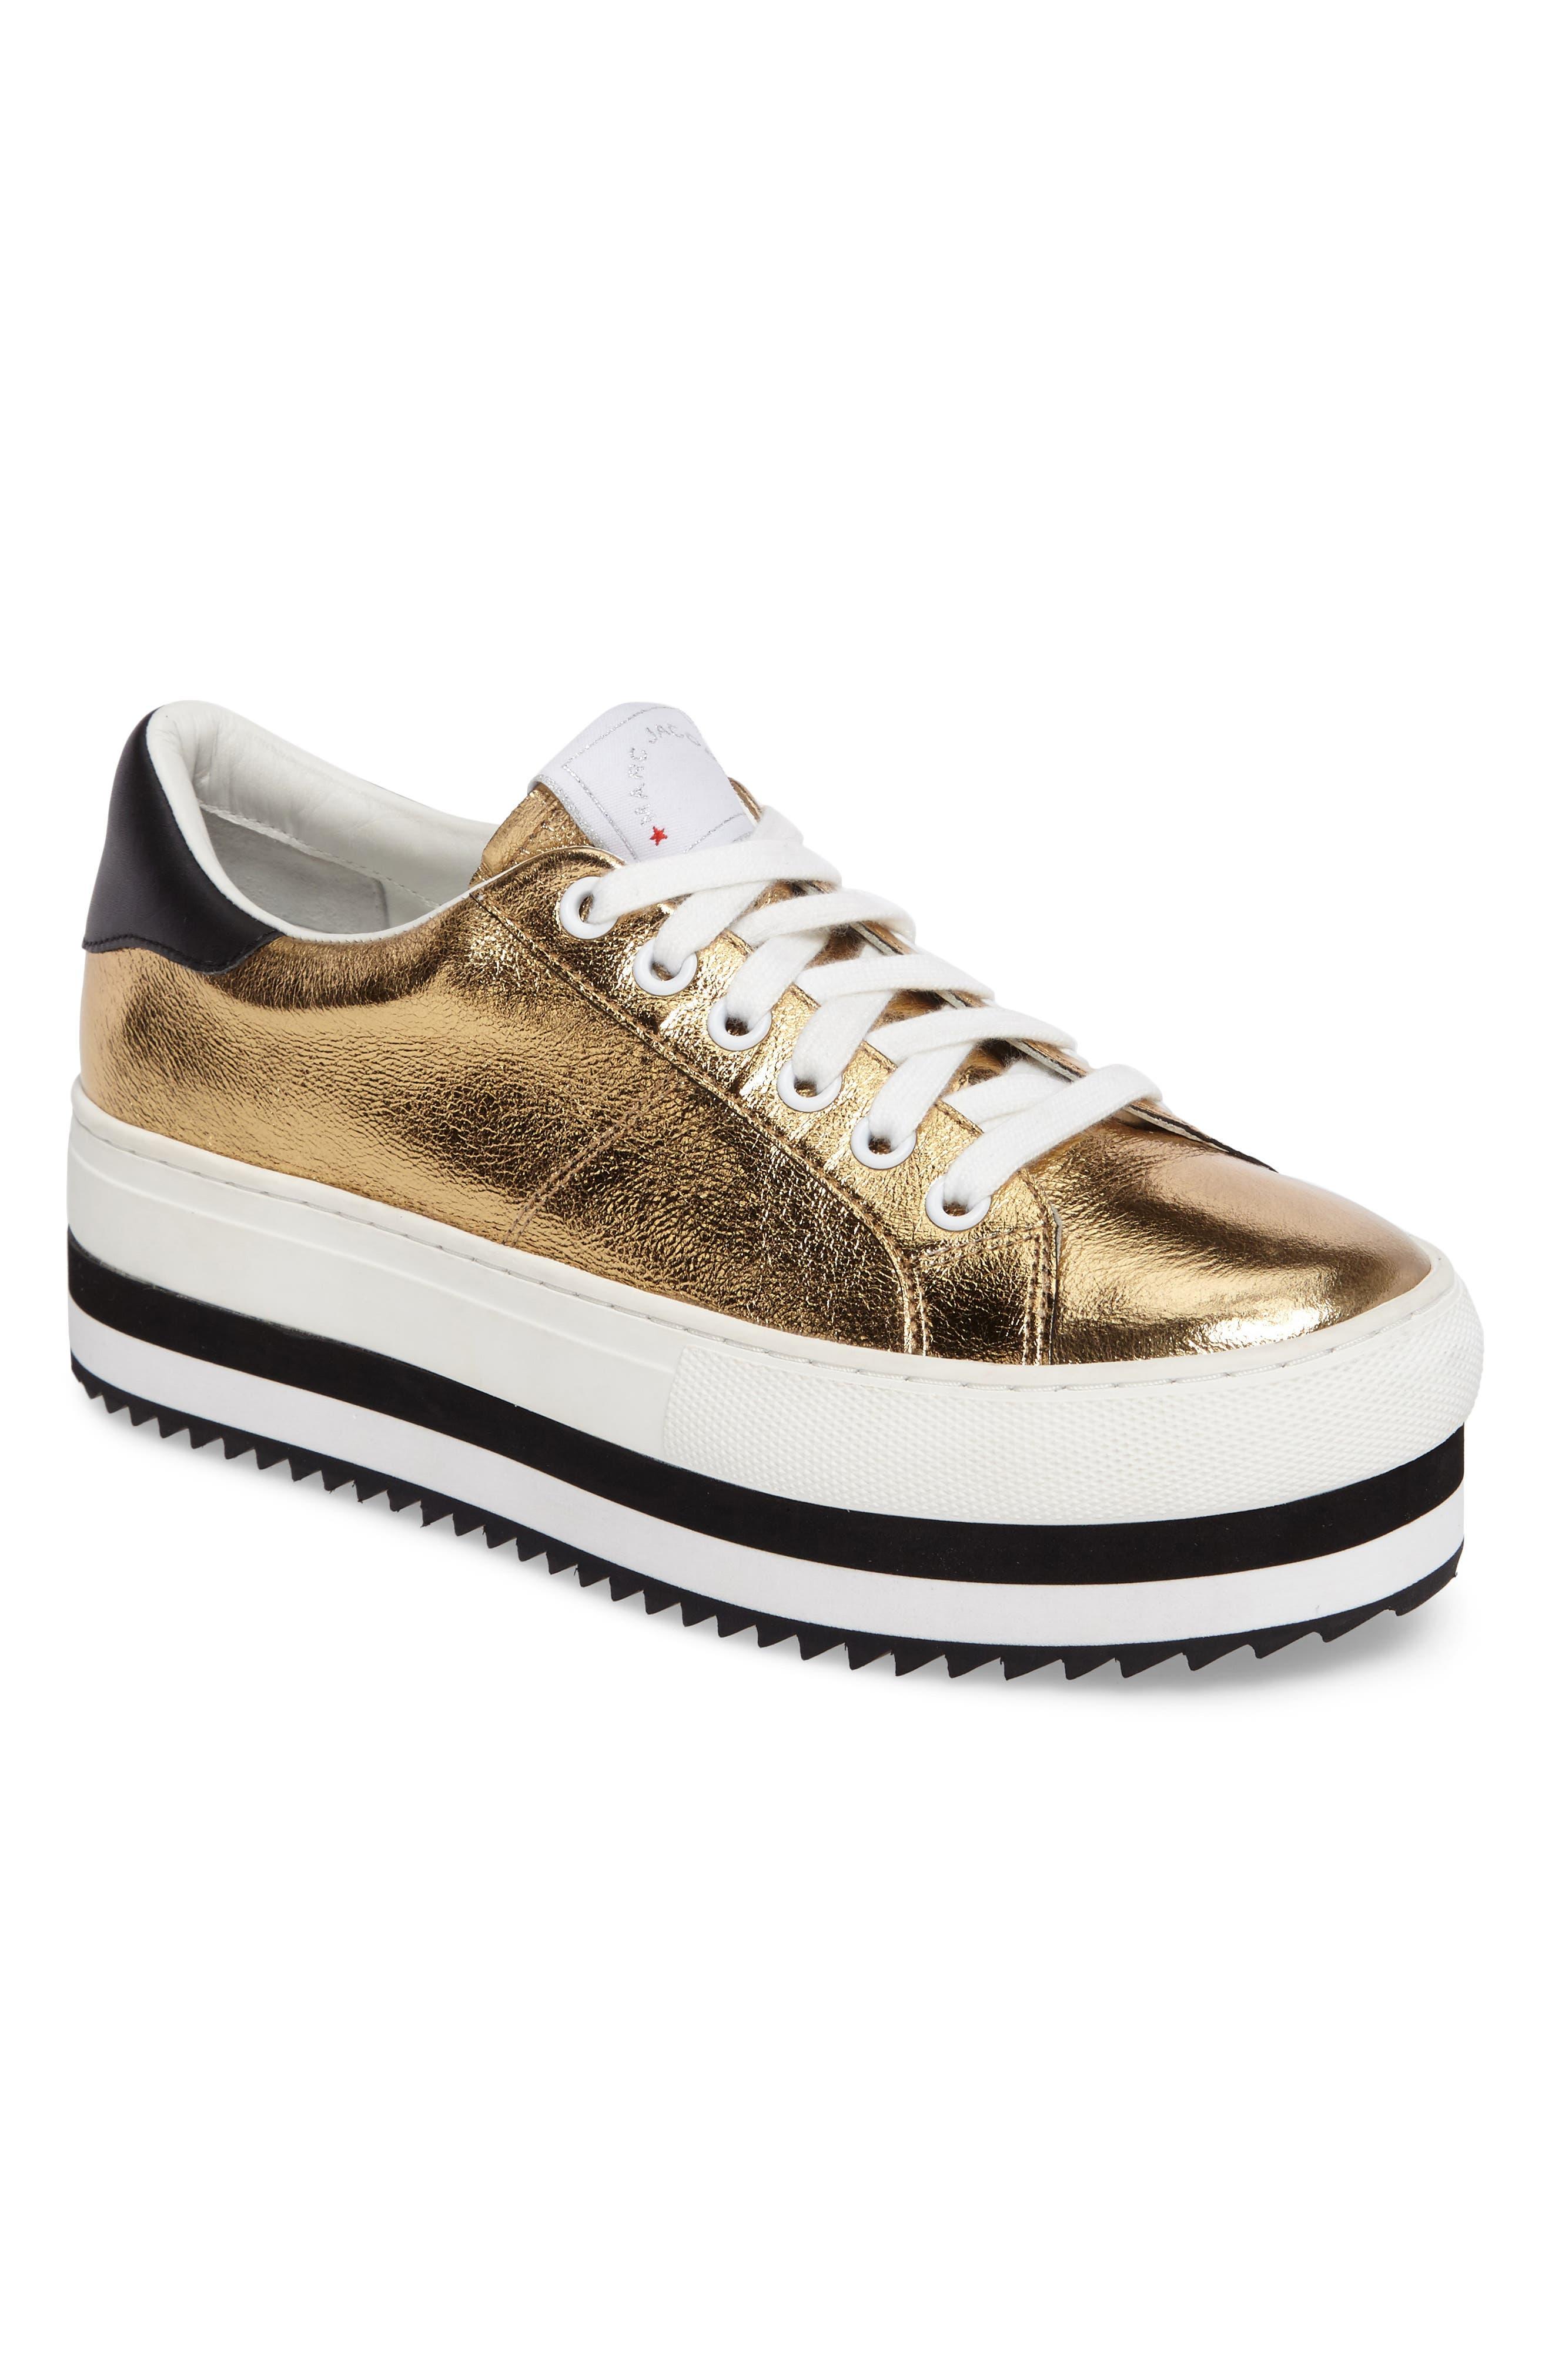 Grand Platform Sneaker,                         Main,                         color, Gold